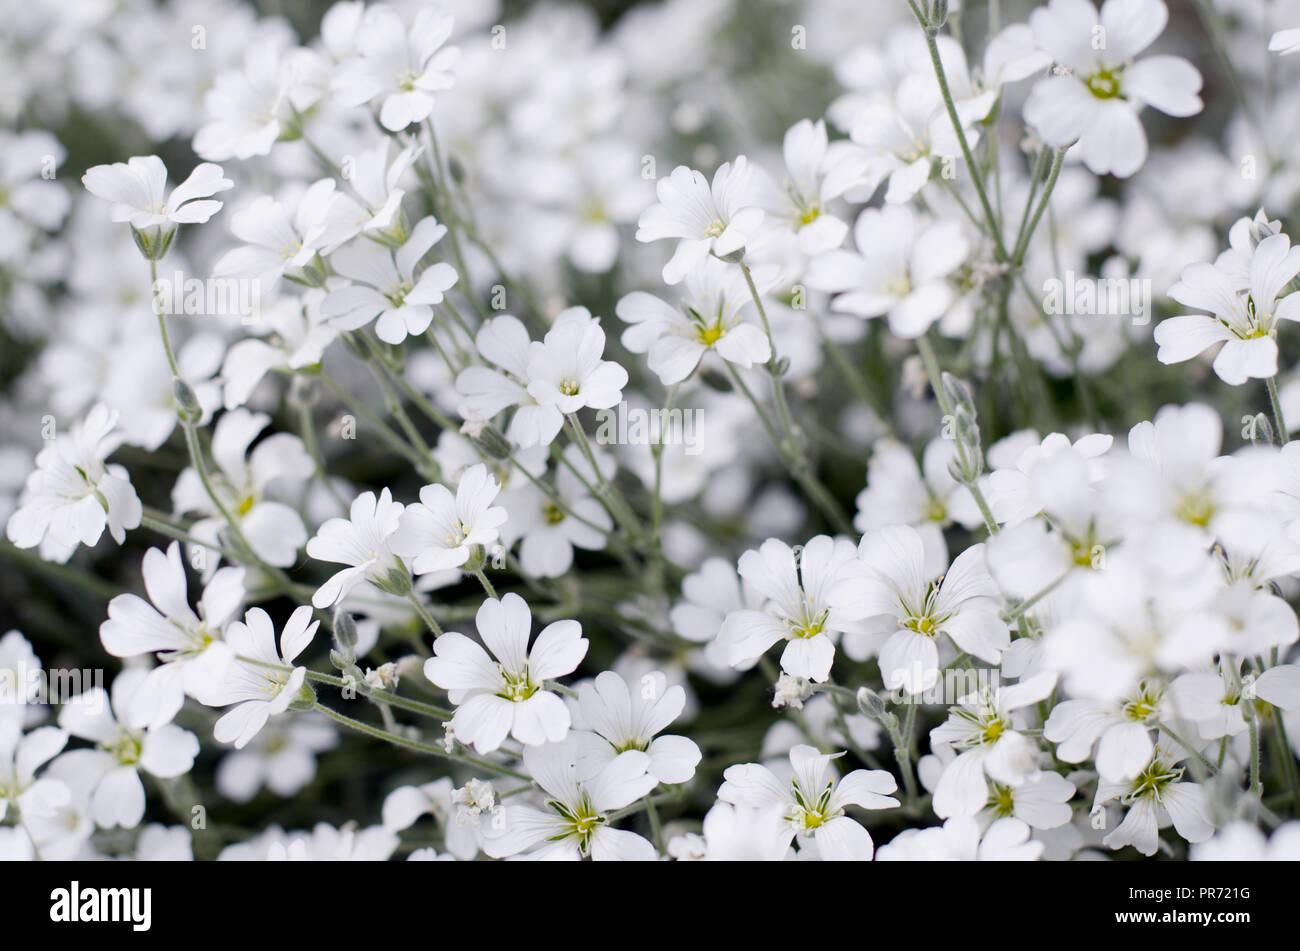 Cerastium Tomentosum In Bloom Beautiful White Flowers Background